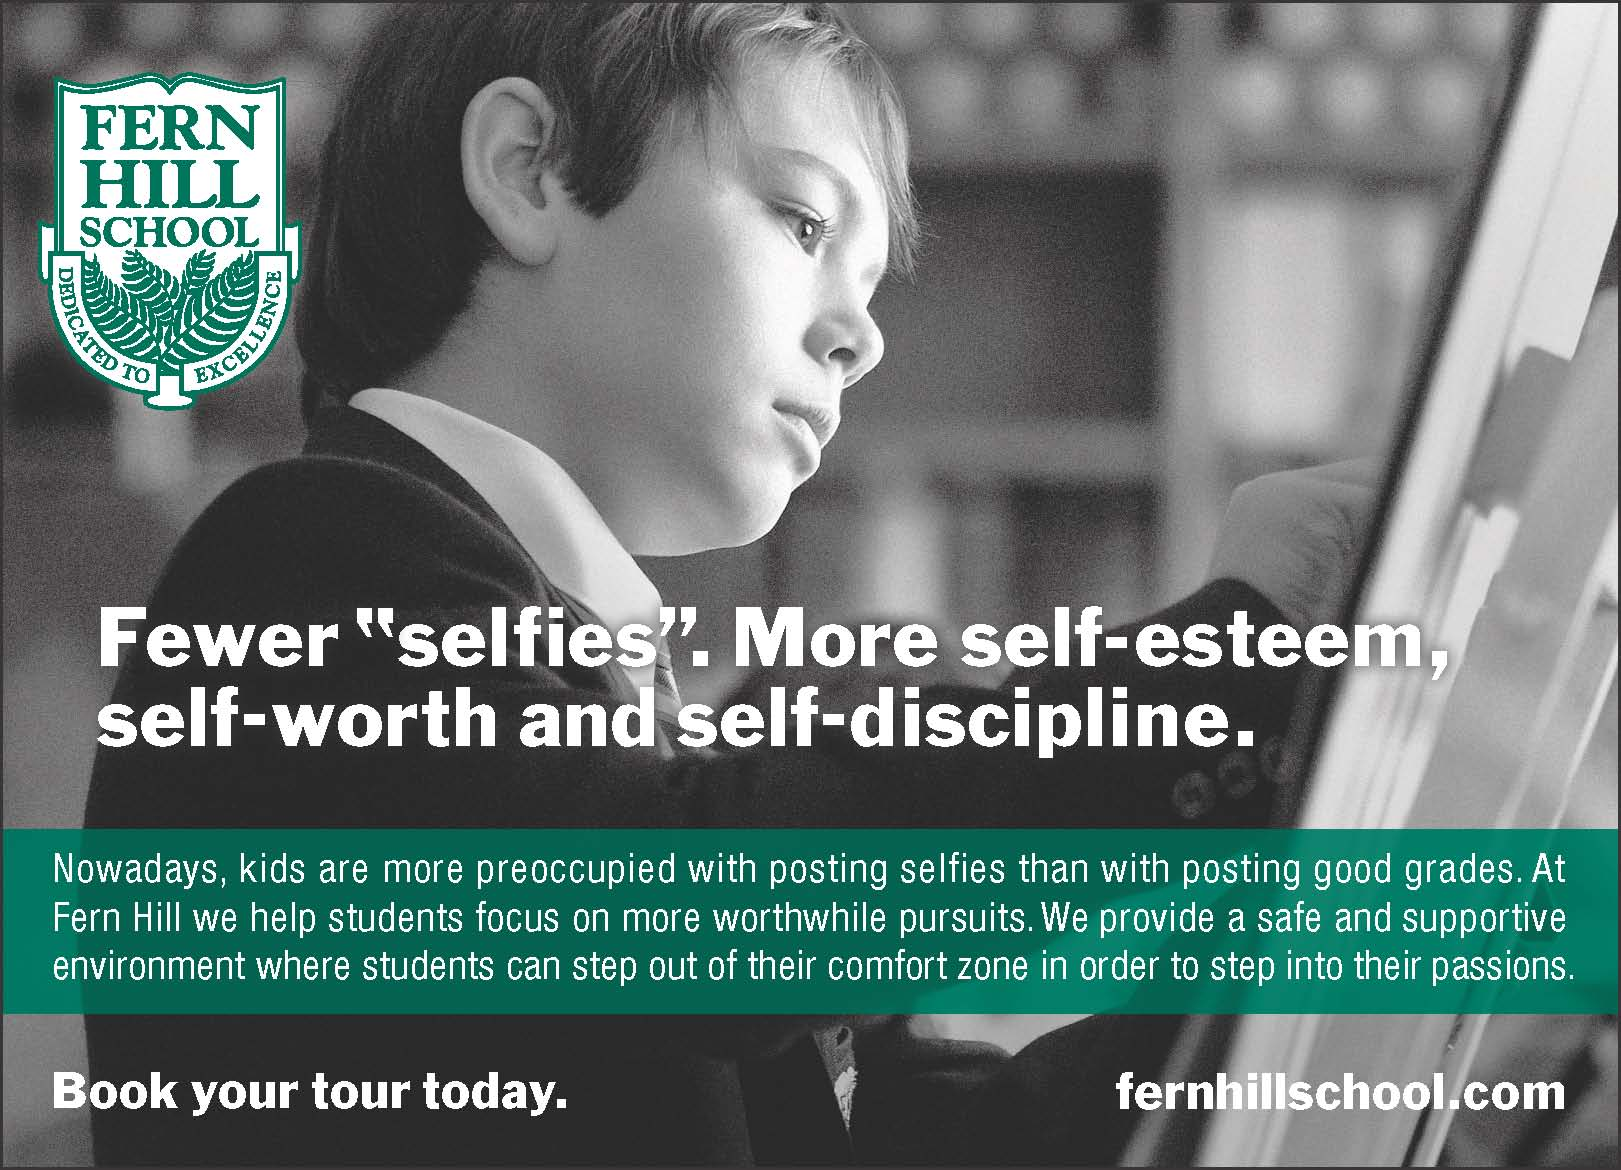 Fern Hill _Fewer selfies_ ad.jpg